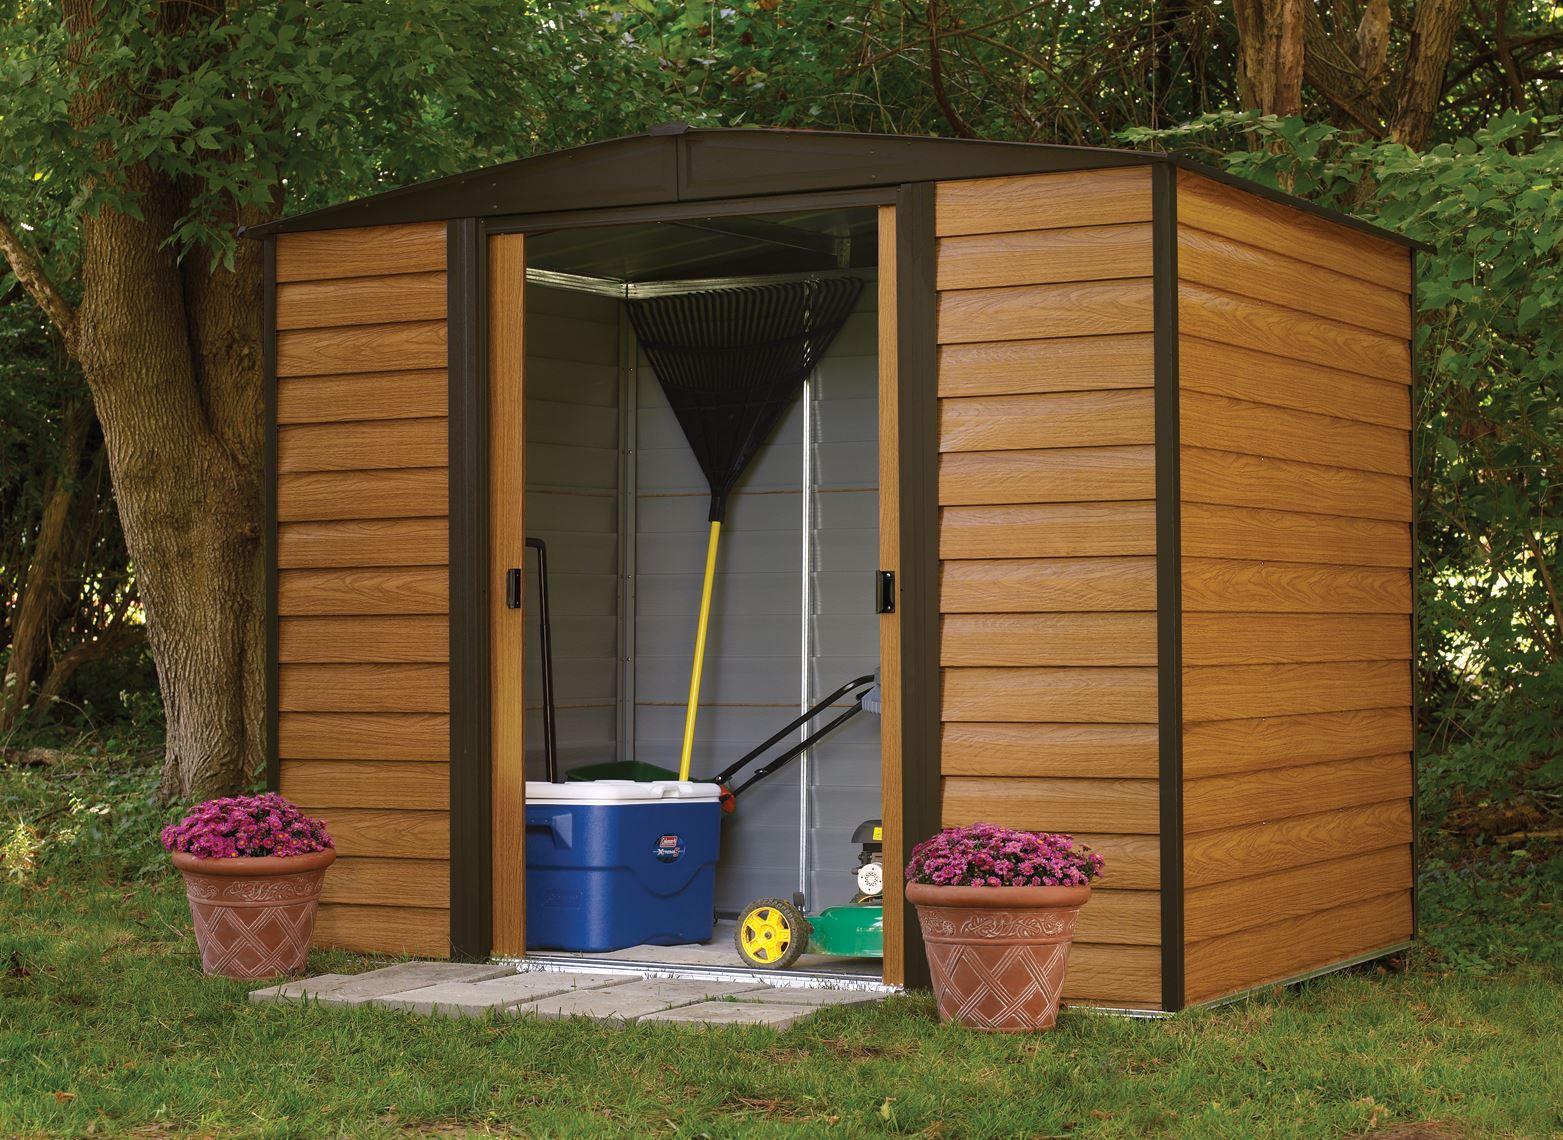 Arrow Galvanized Steel Garden Shed Wr86 4m2